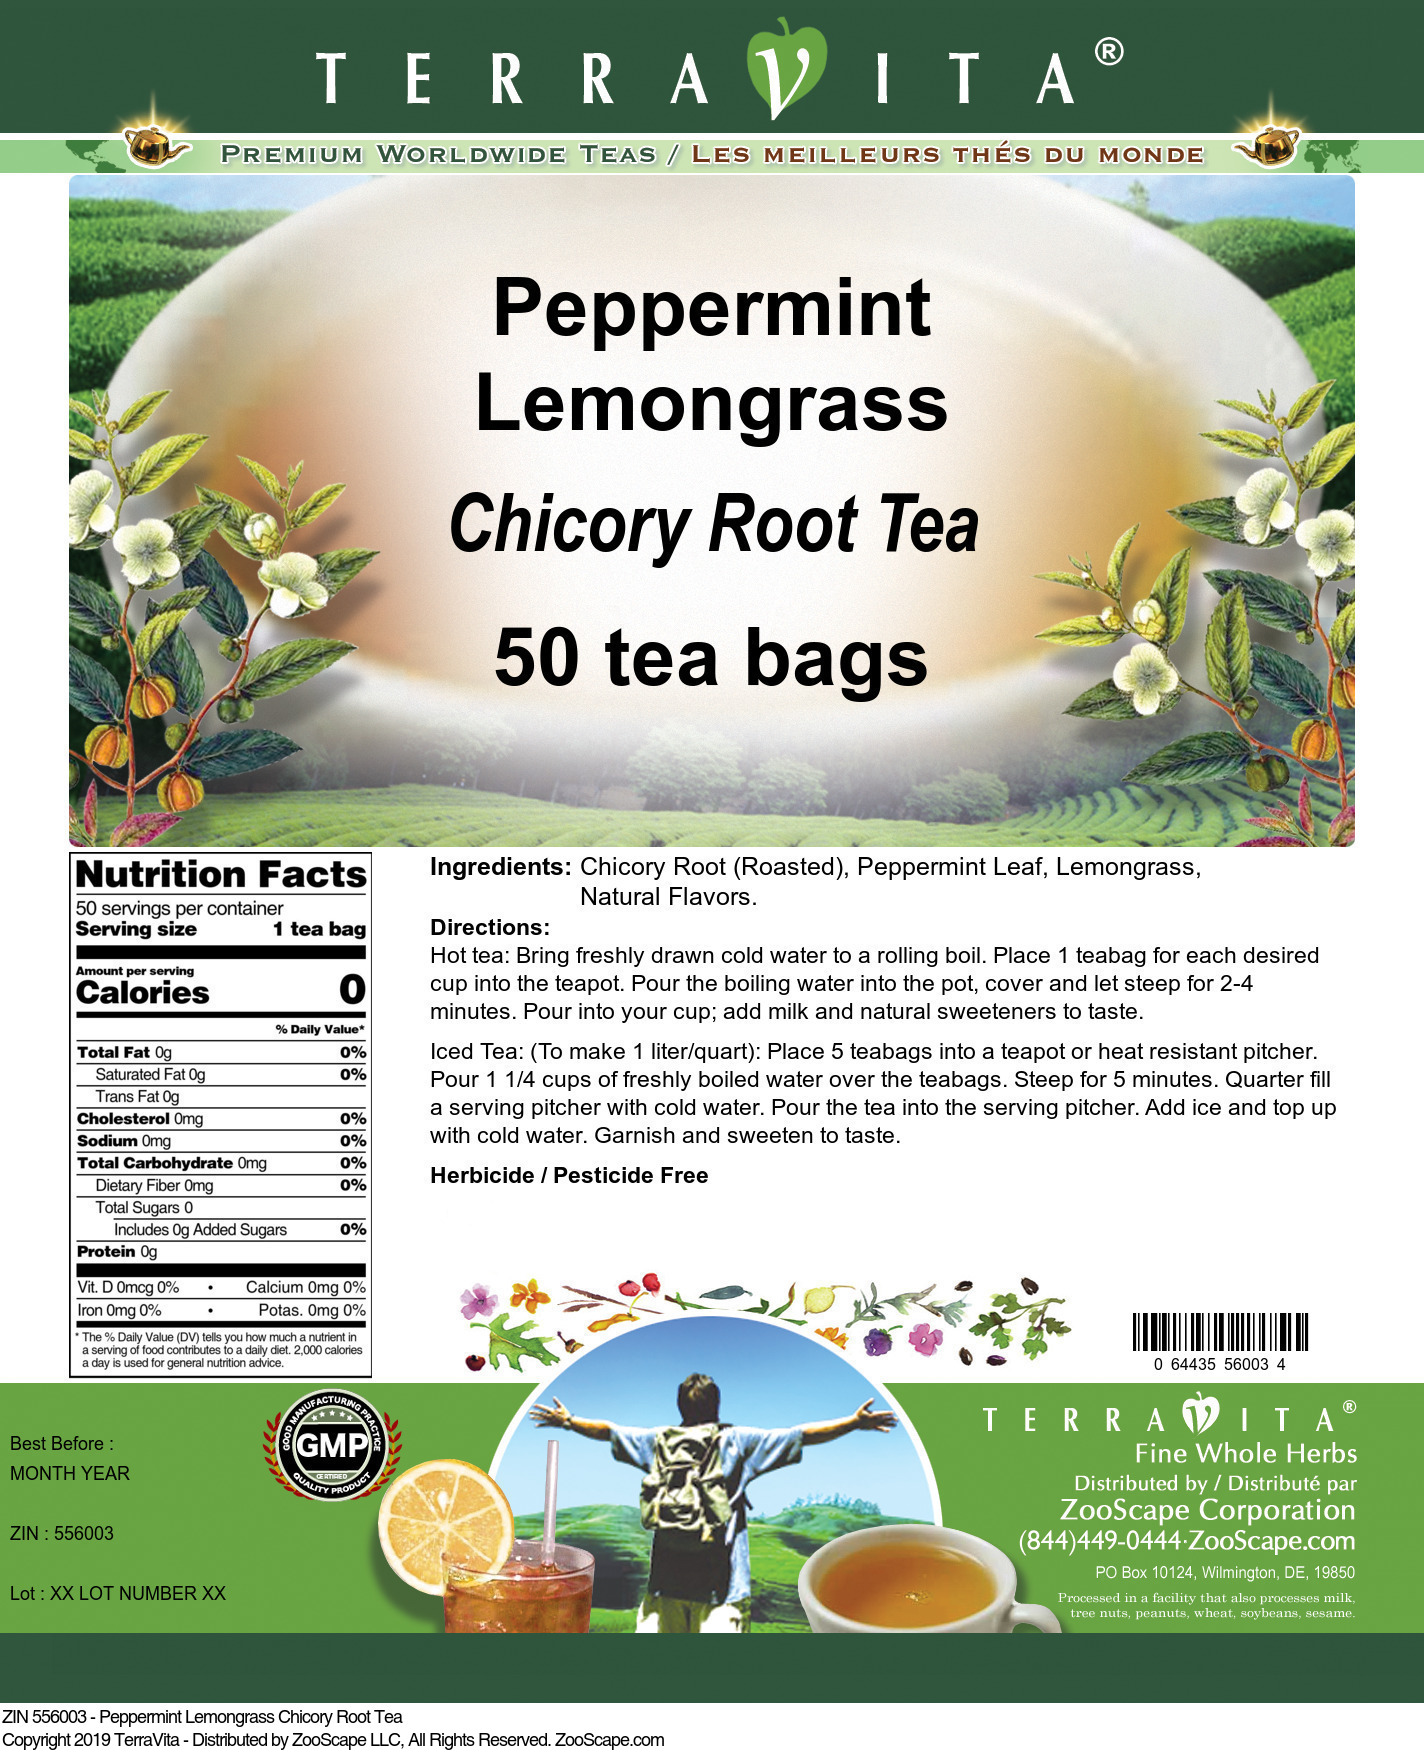 Peppermint Lemongrass Chicory Root Tea